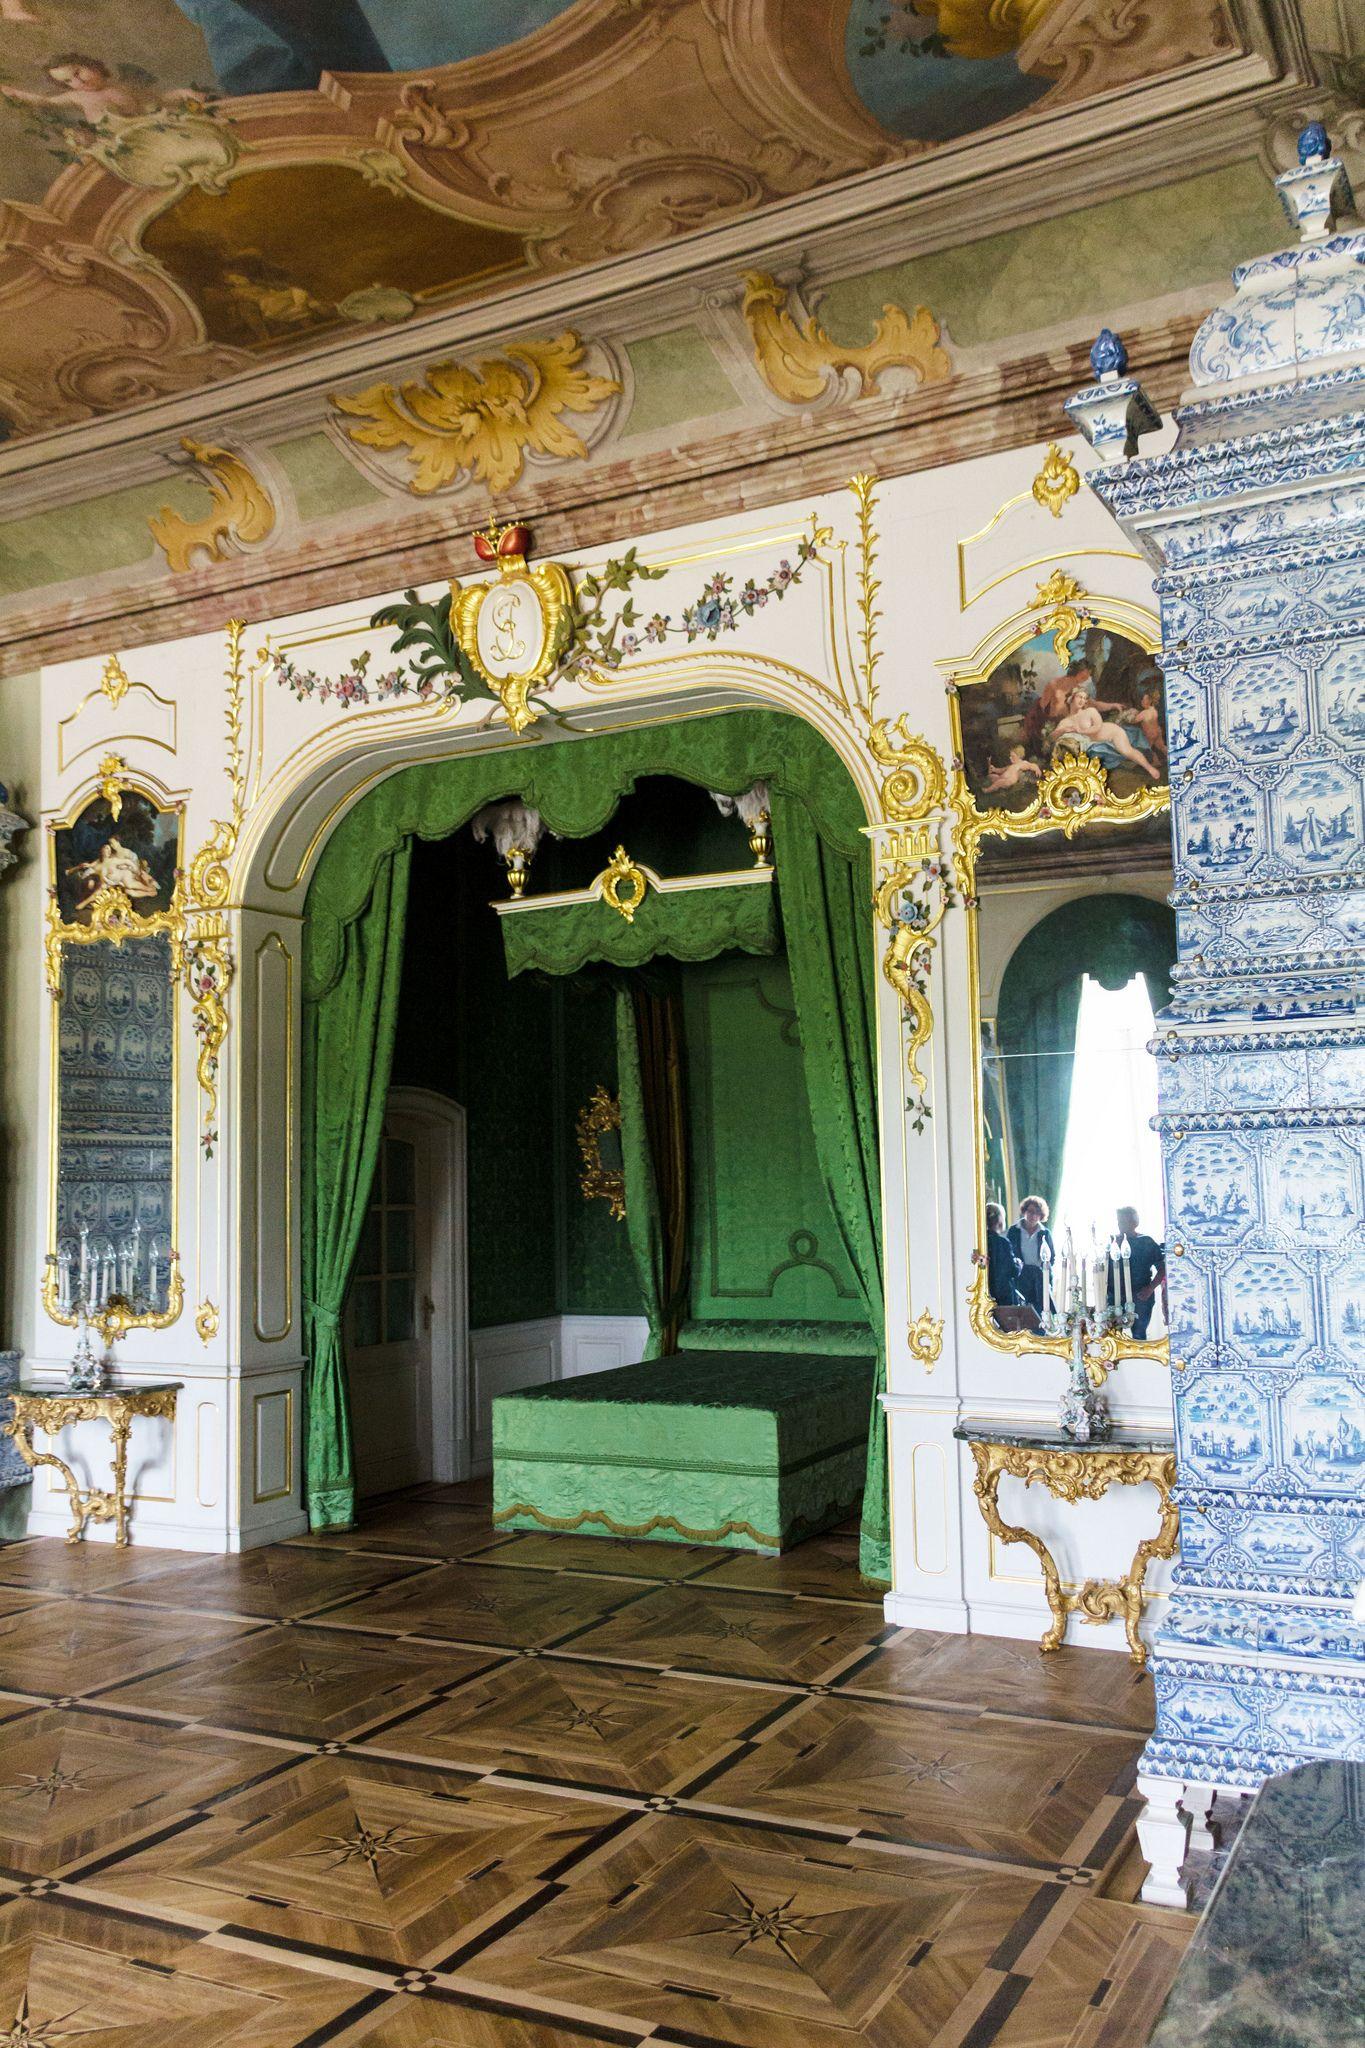 Schlafzimmer Versailles | Schlafzimmer Im Schloss Rundale Europeiska Palats Och Herrgardar